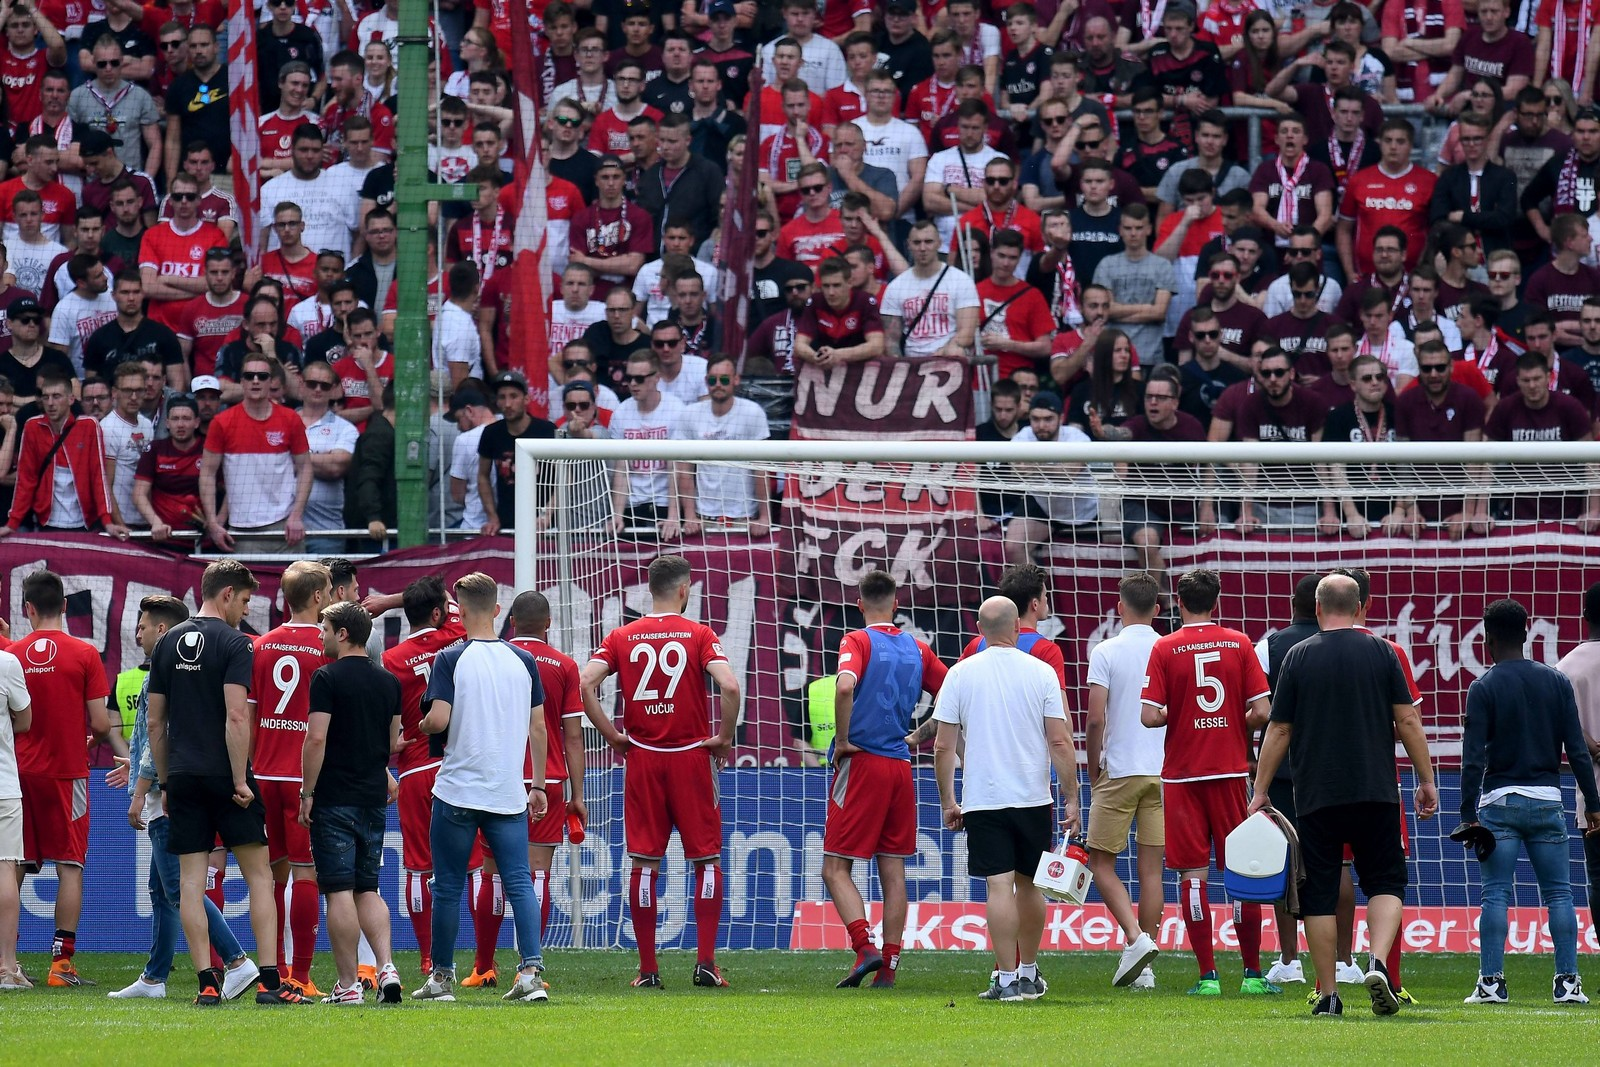 Enttäuschte Spieler des 1. FCK vor den eigenen Fans